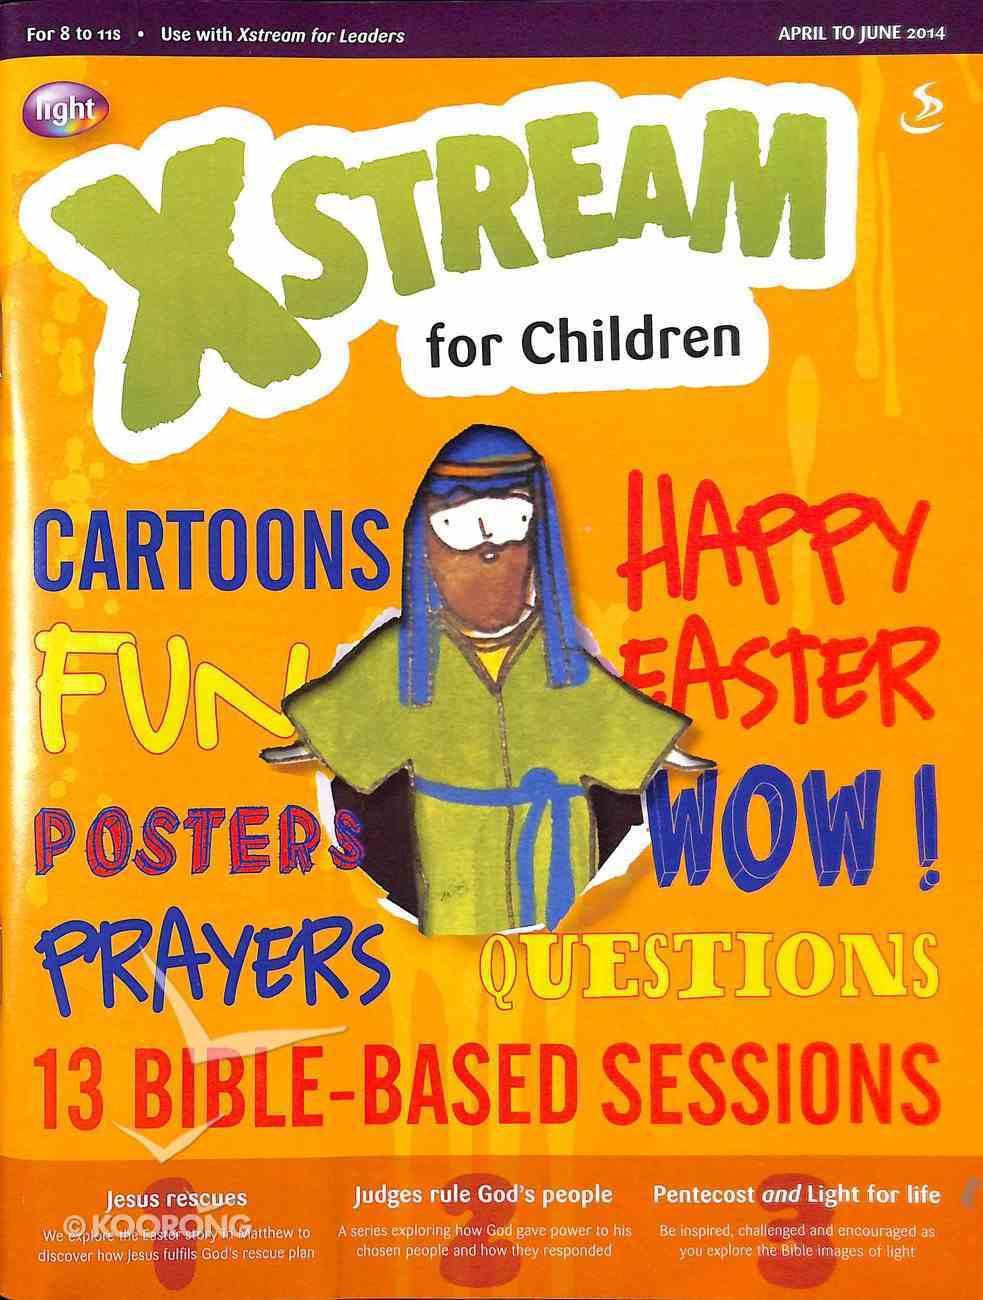 Light: Xstream 2014 #02: Apr-Jun Student's Guide (8-11 Yrs) Paperback